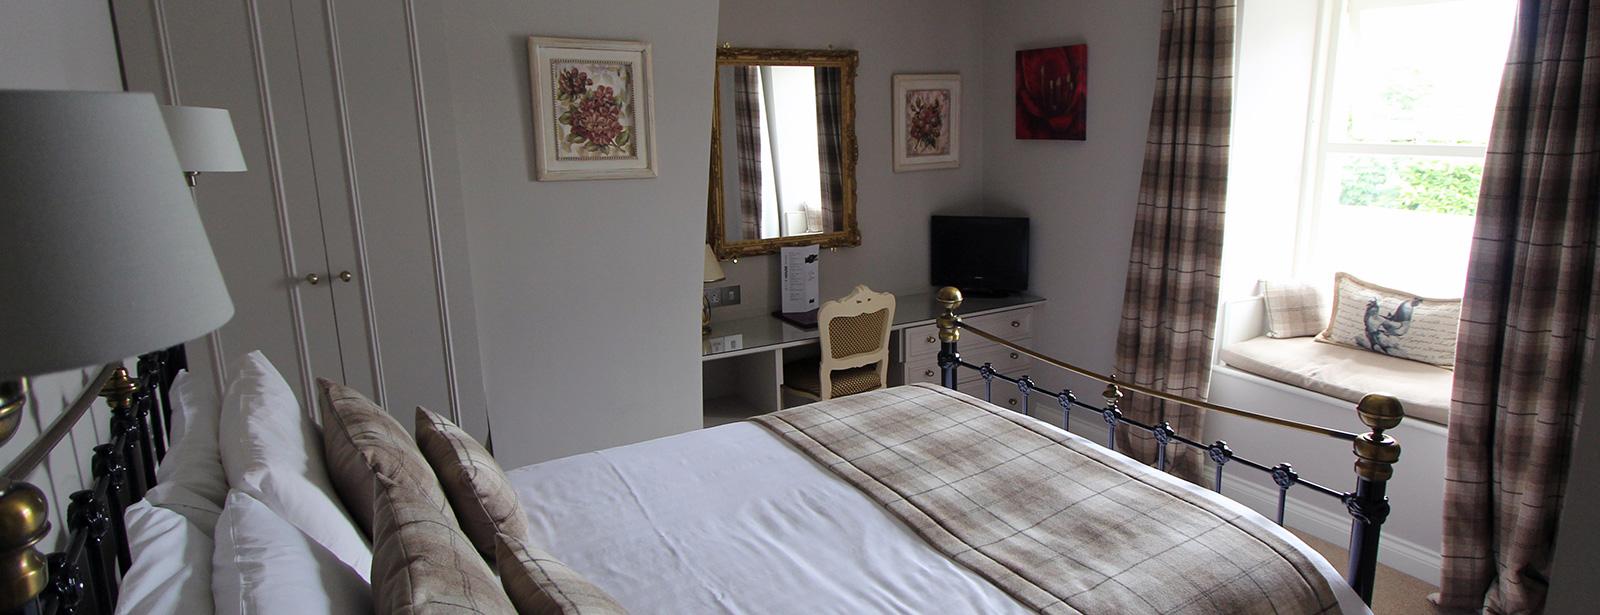 Room-4-(3)-1600.jpg